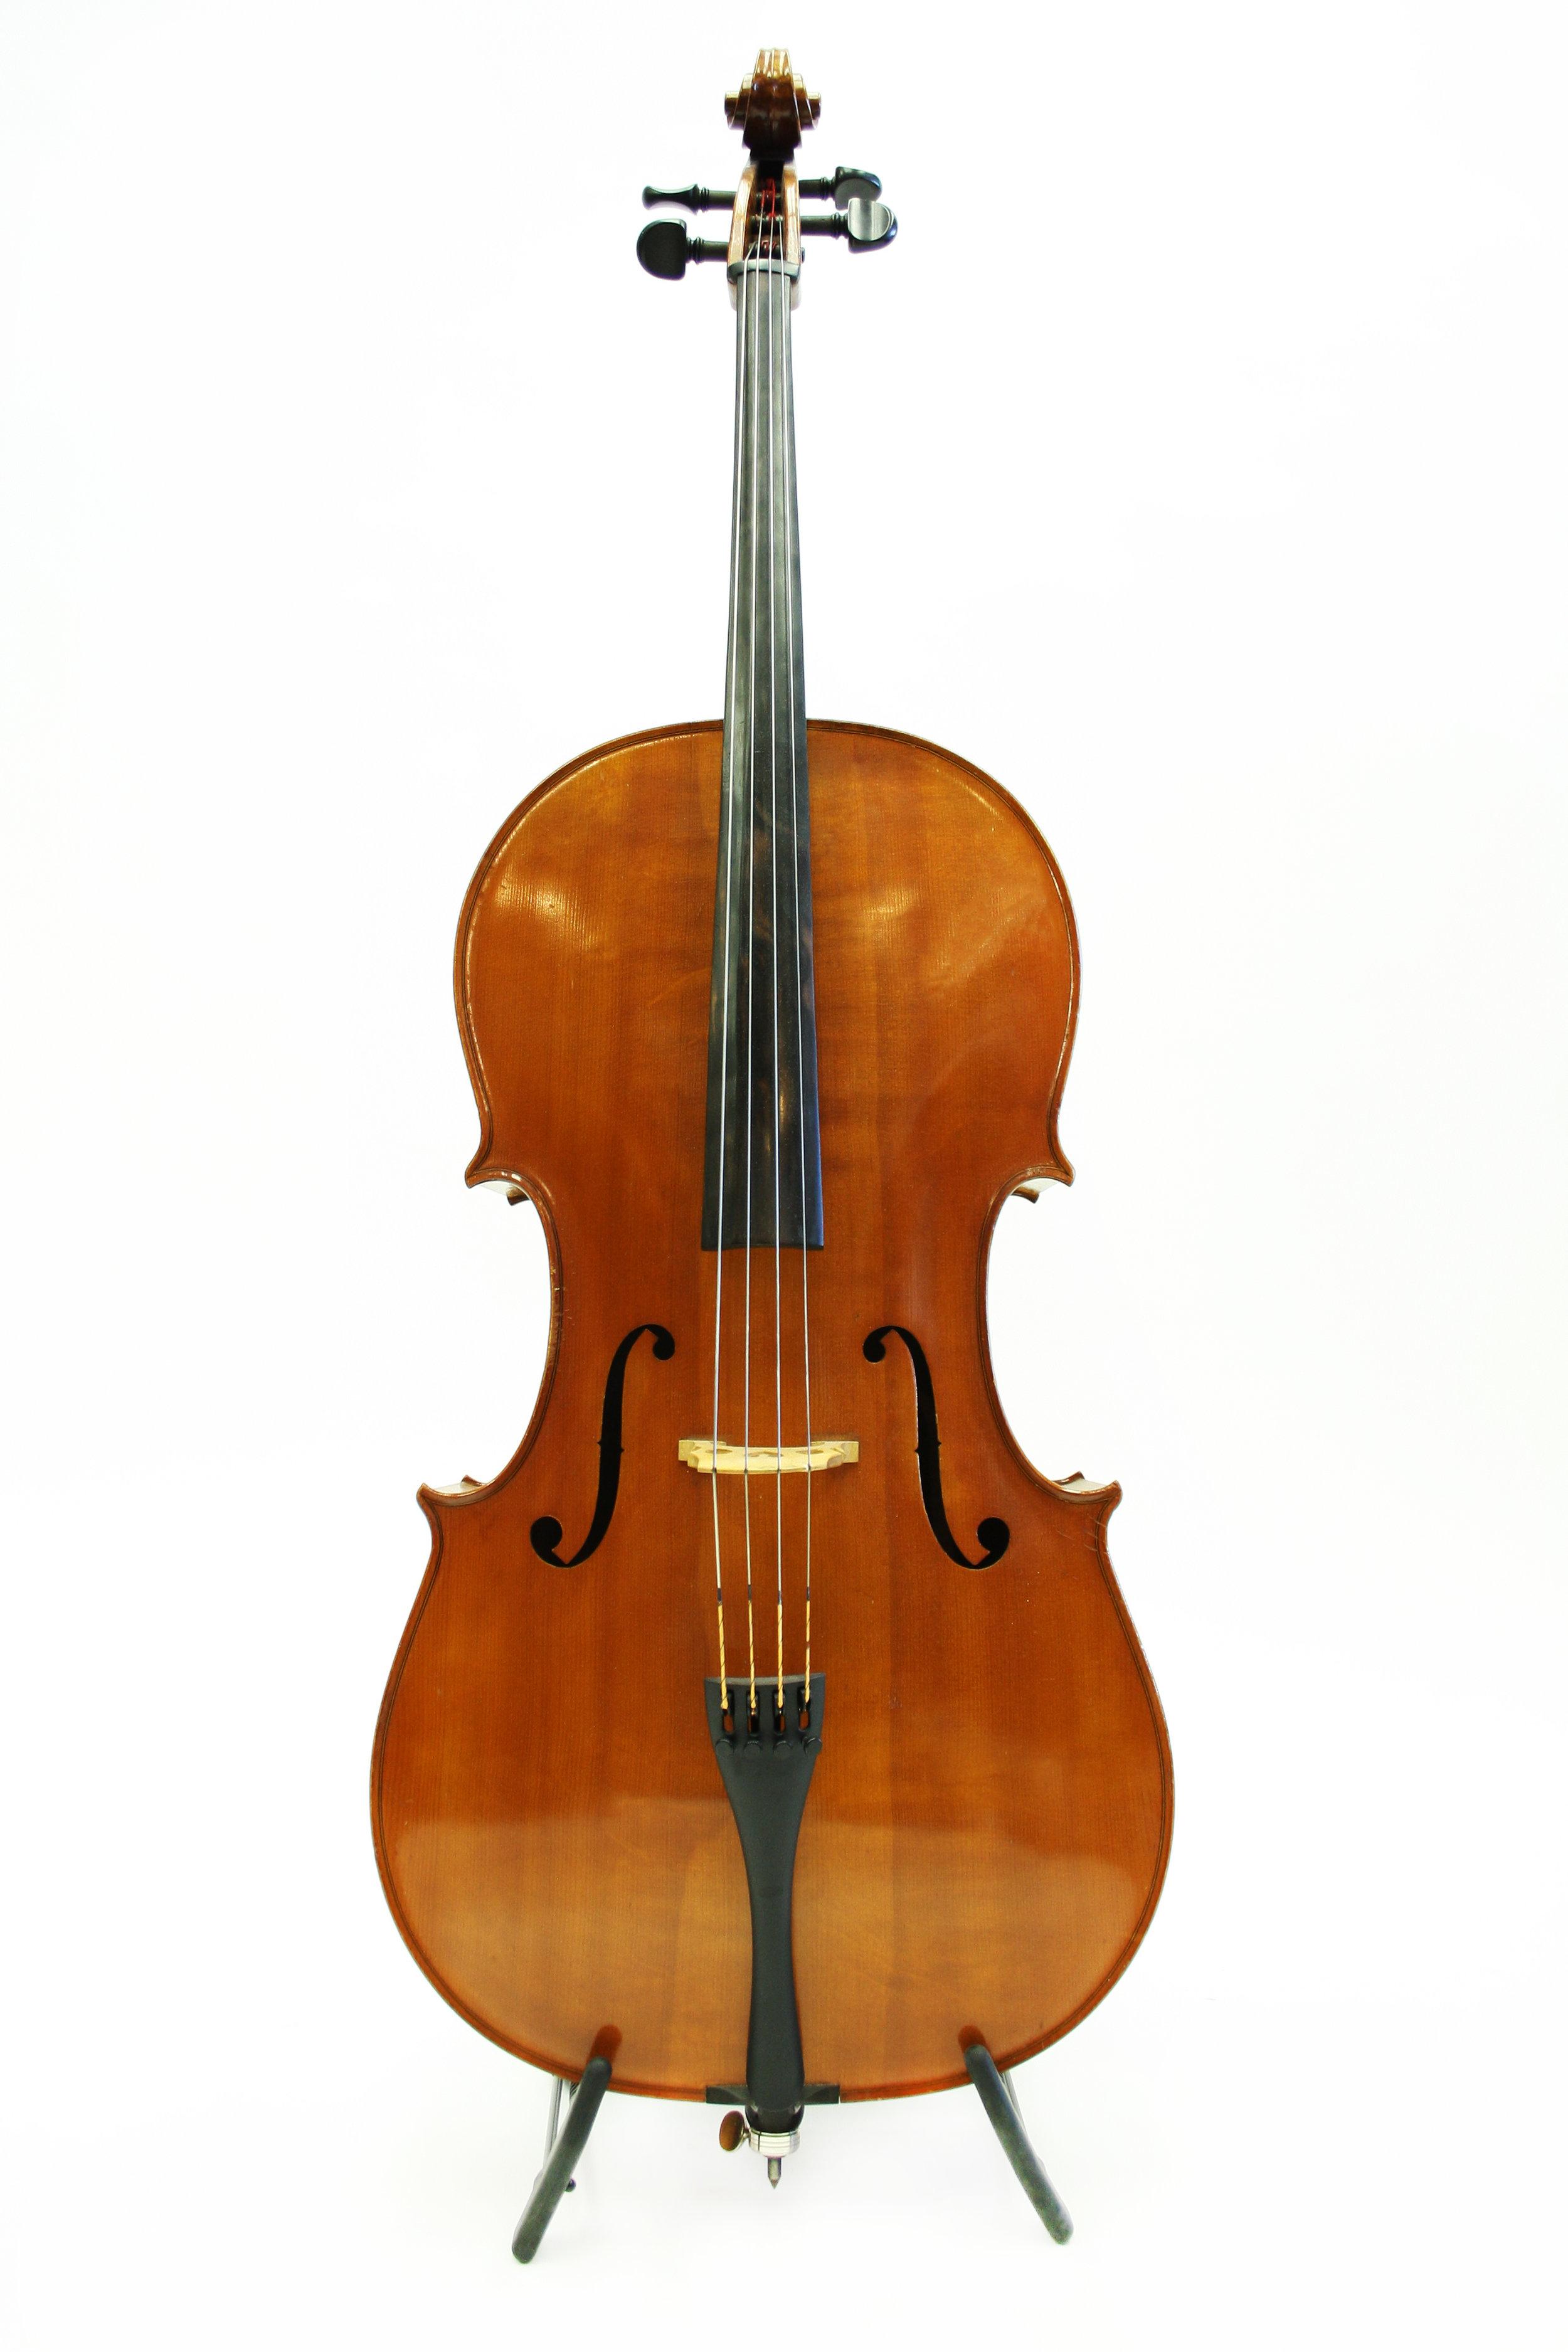 Max Hoyer 1968 Cello - $6999